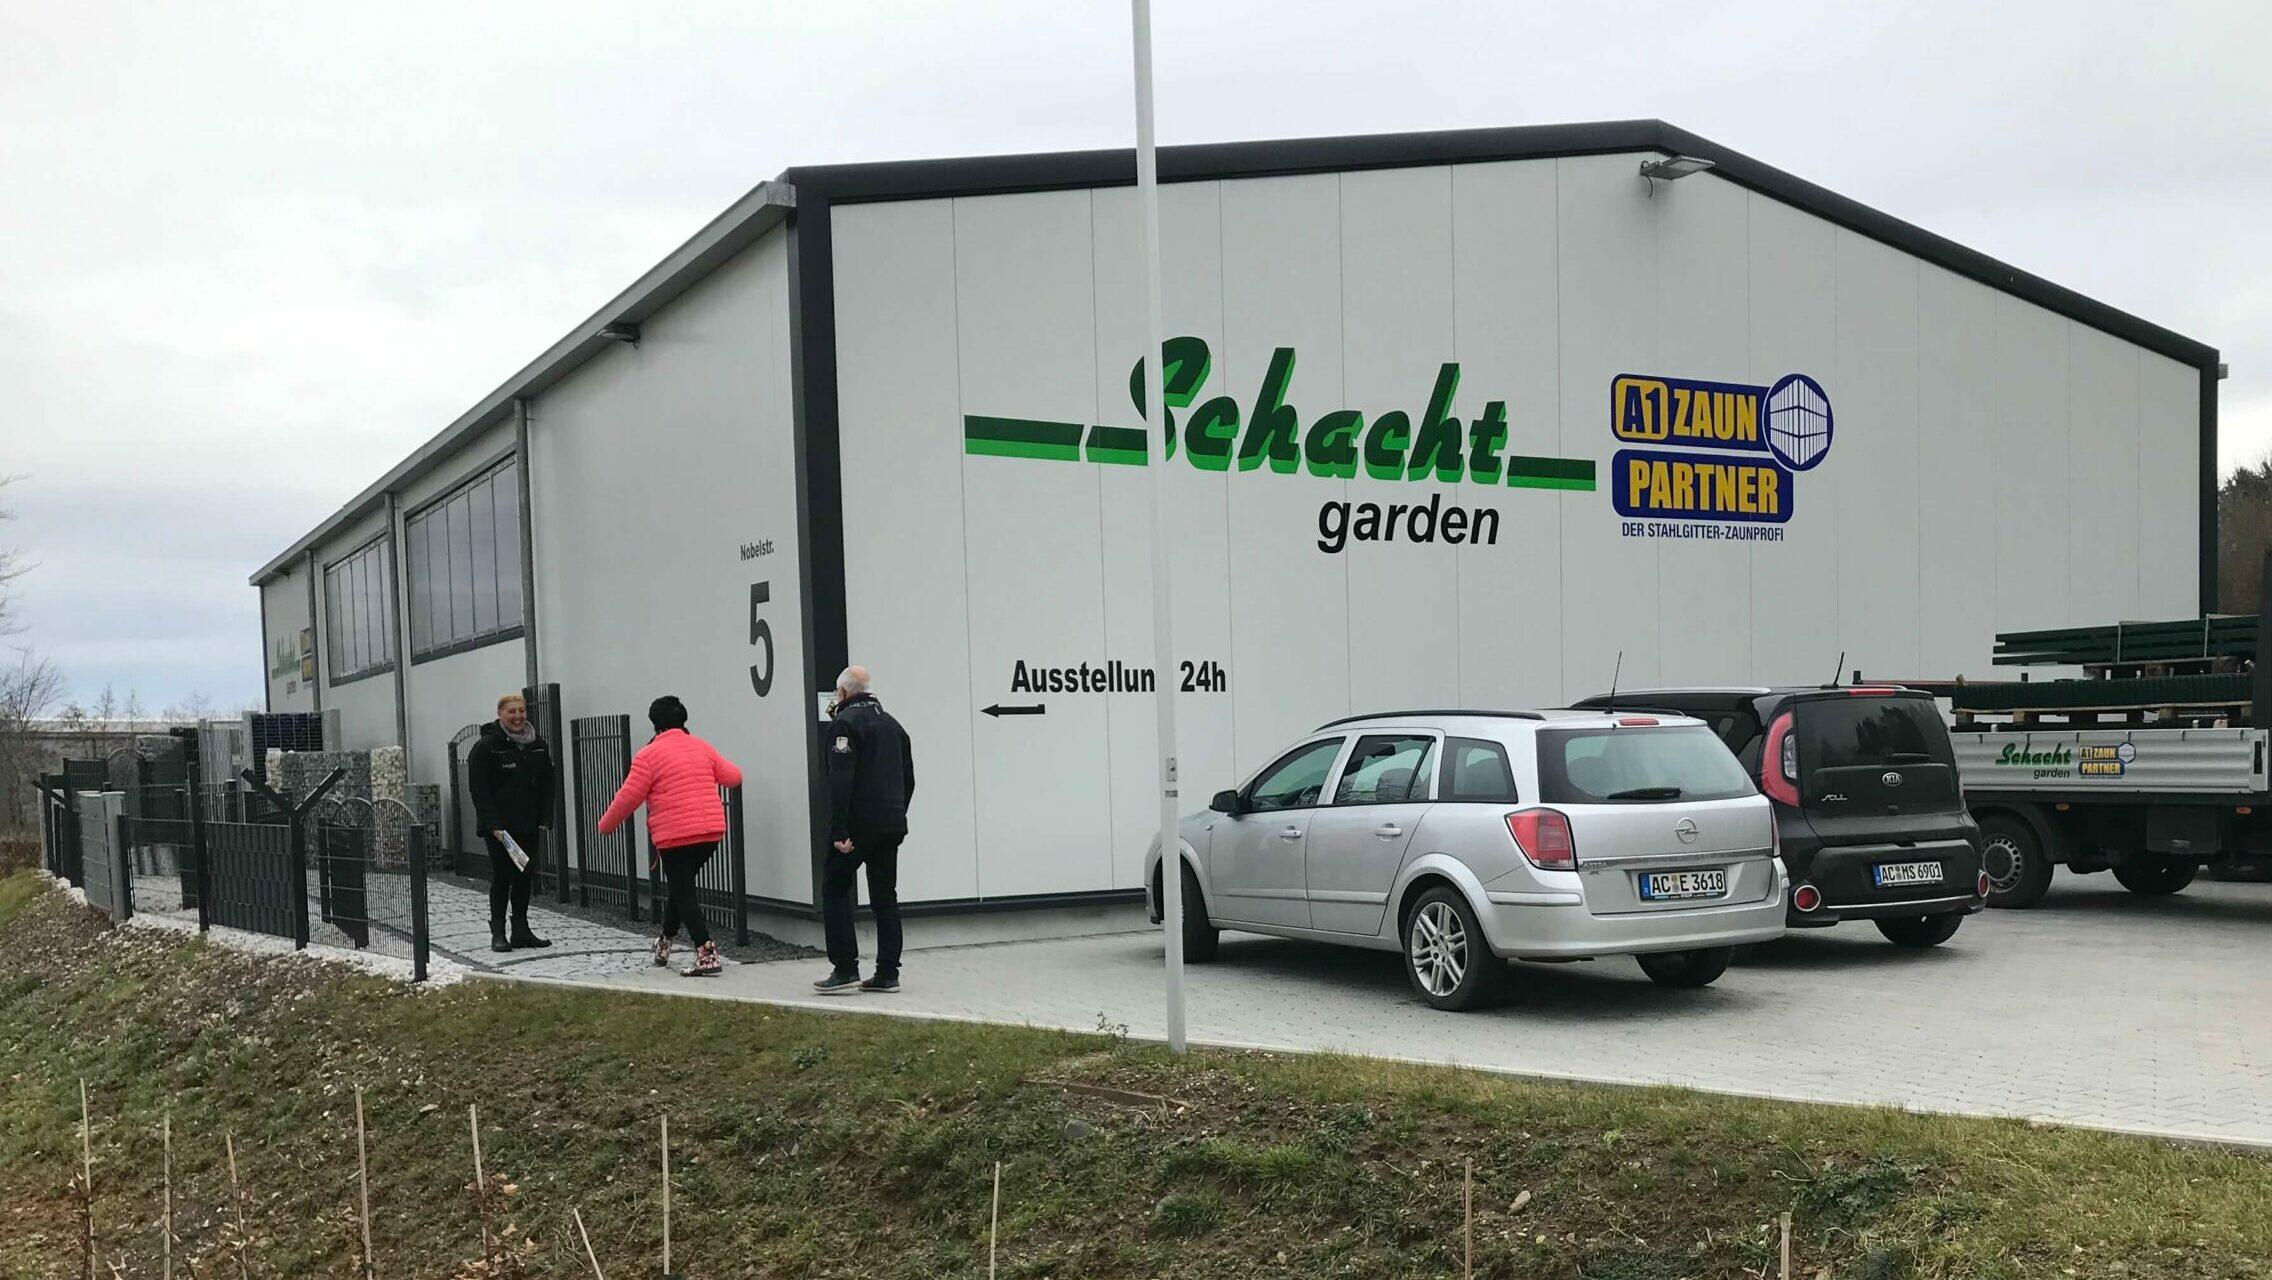 Schacht garden Logistikzentrum Ansicht Parkplatz